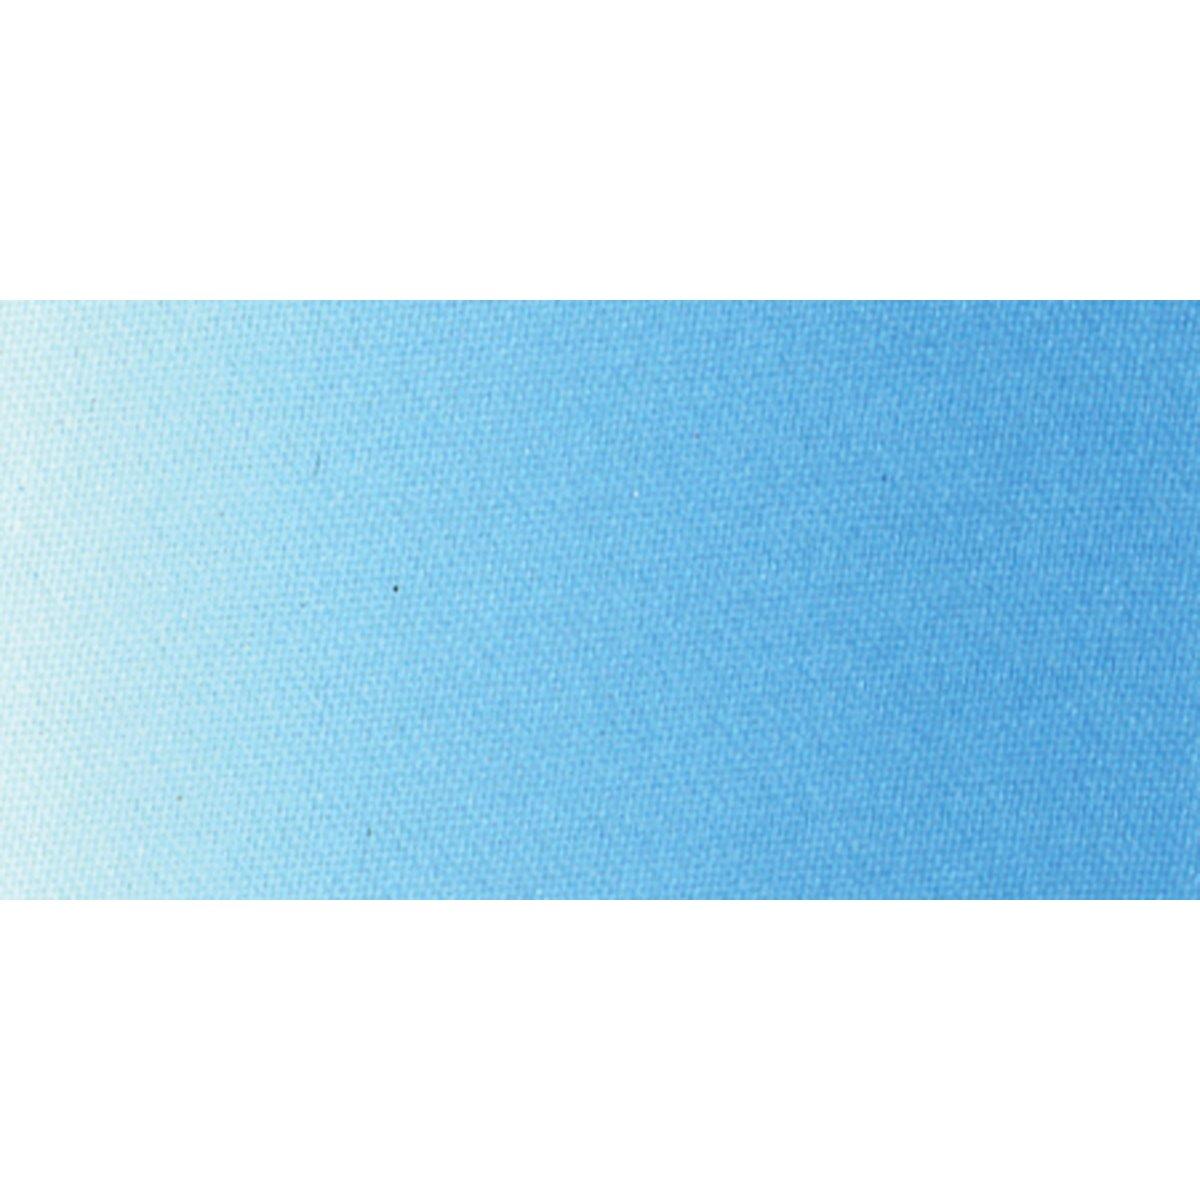 Wrights 117-798-002 Printed Single Fold Satin Blanket Binding, Rainbow, 4.75-Yard Notions - In Network